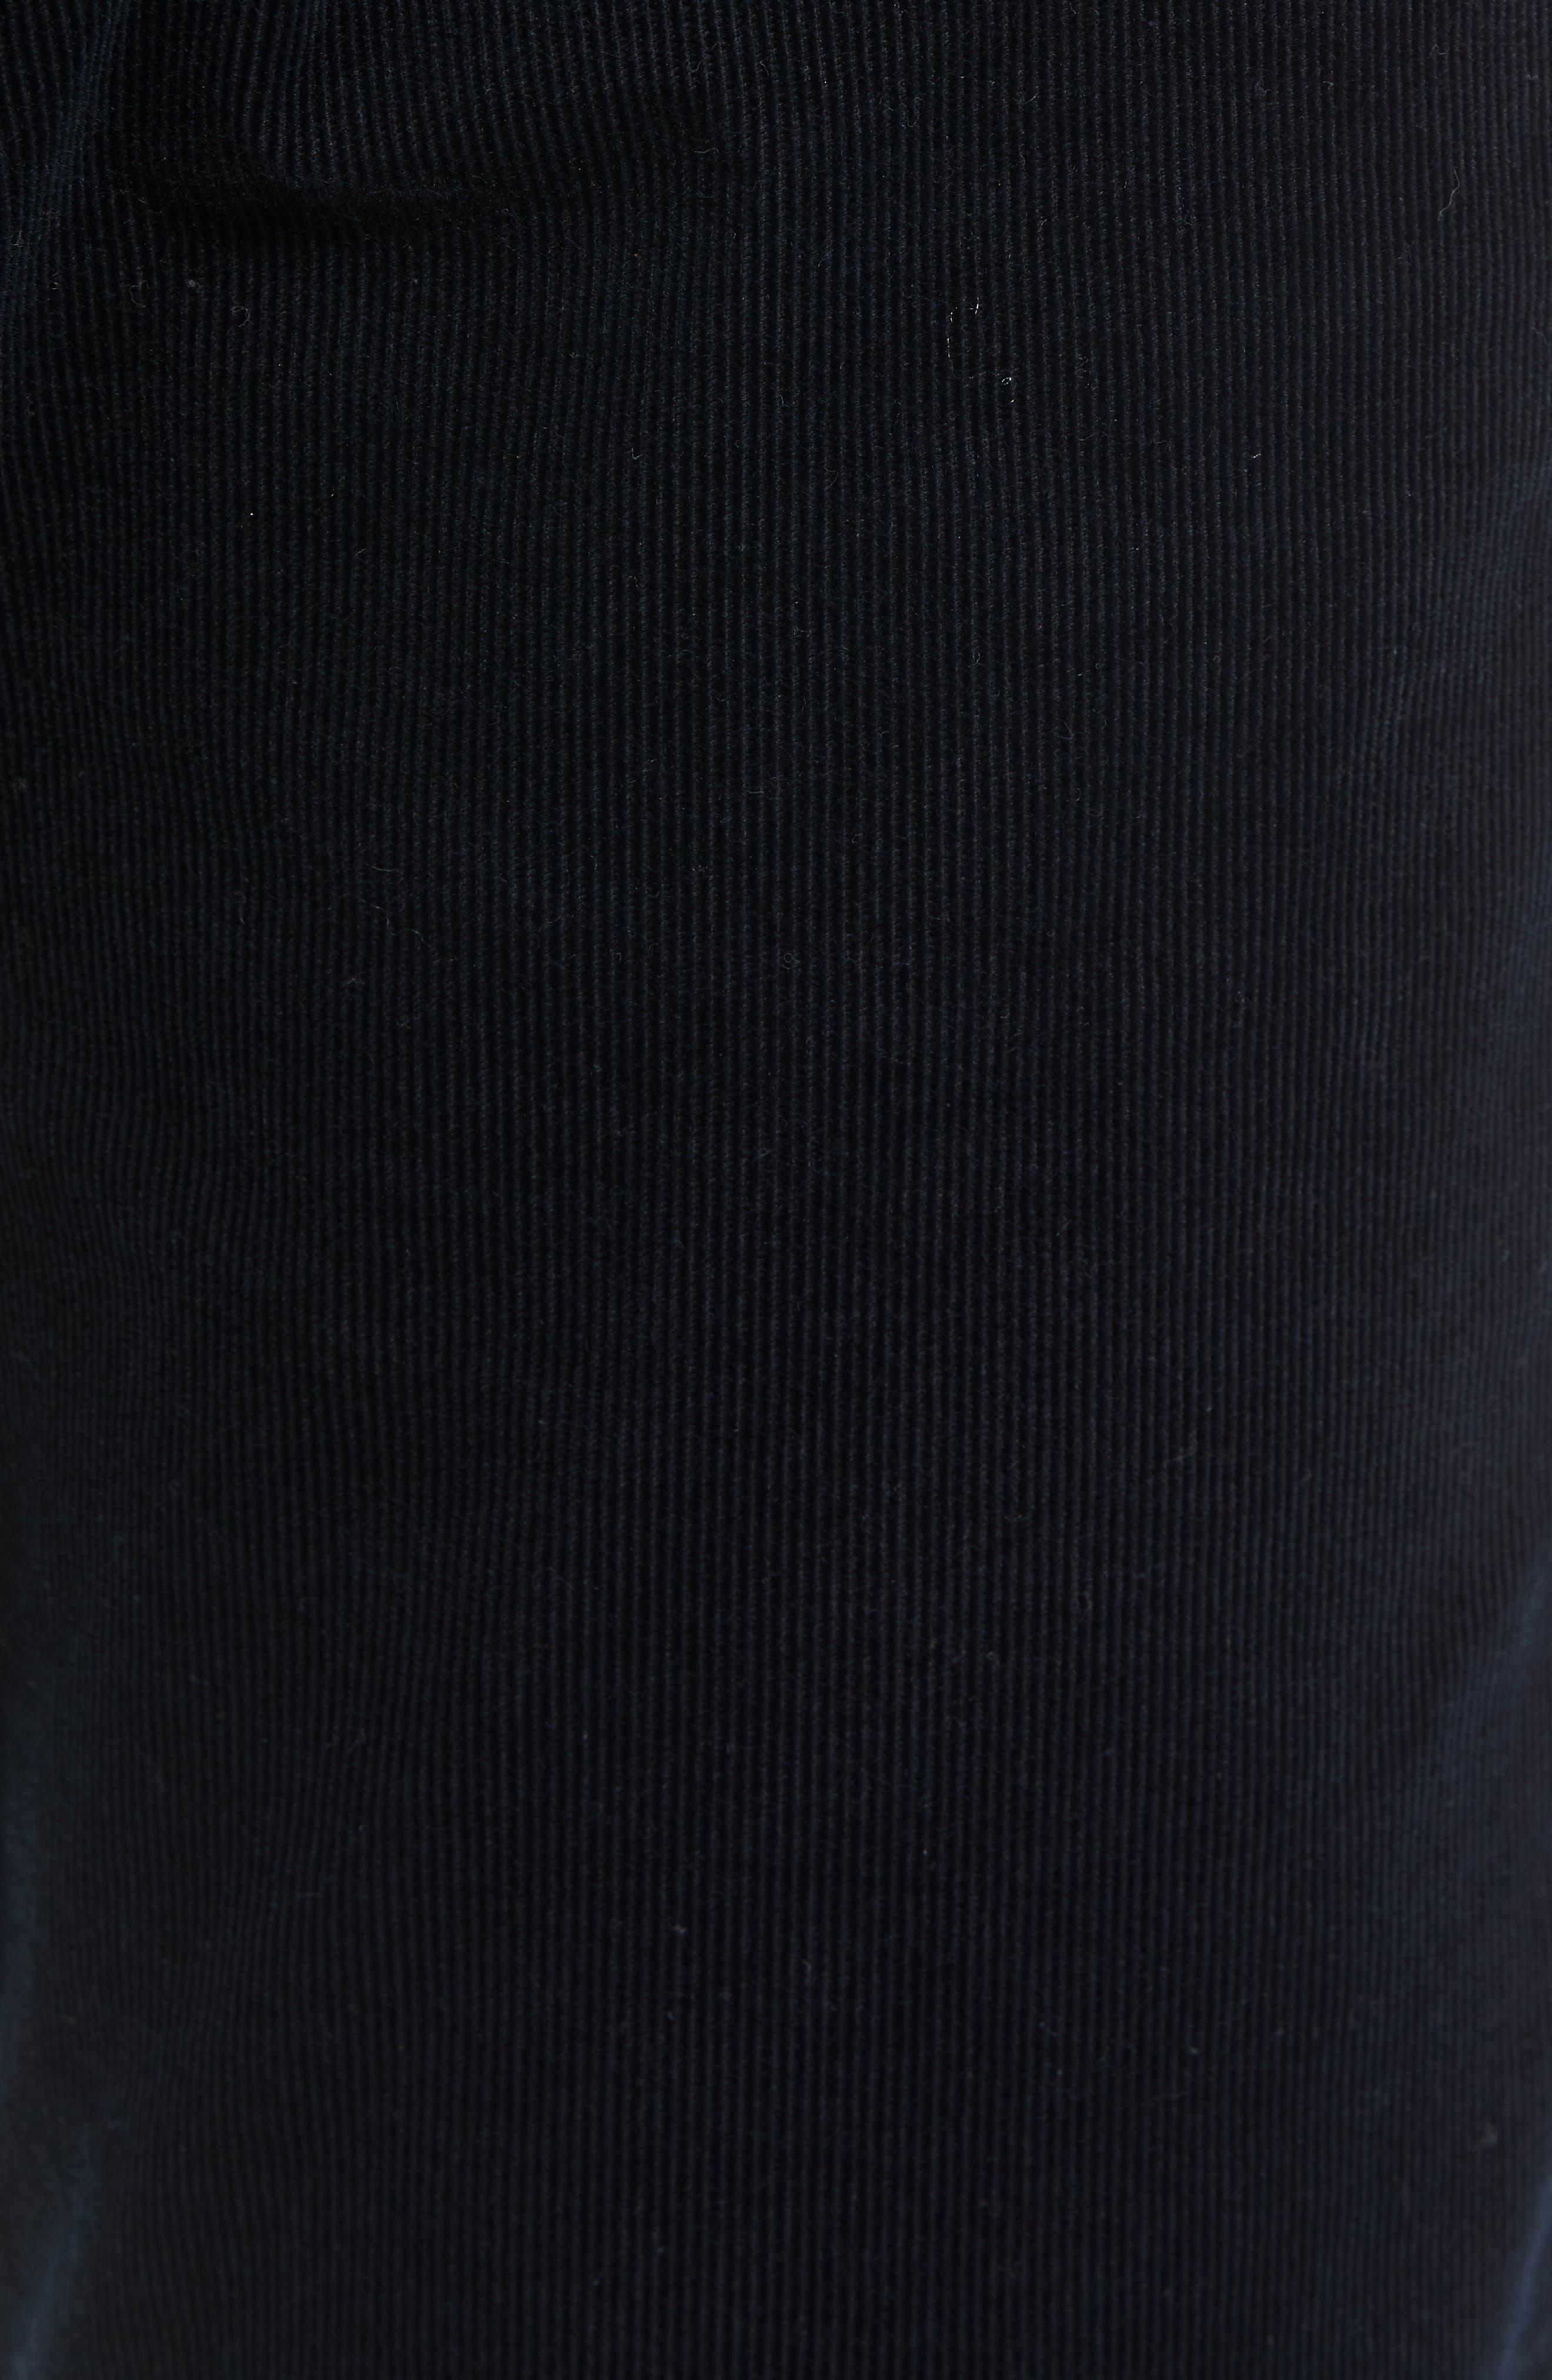 Dylan Slim Fit Corduroy Pants,                             Alternate thumbnail 5, color,                             001